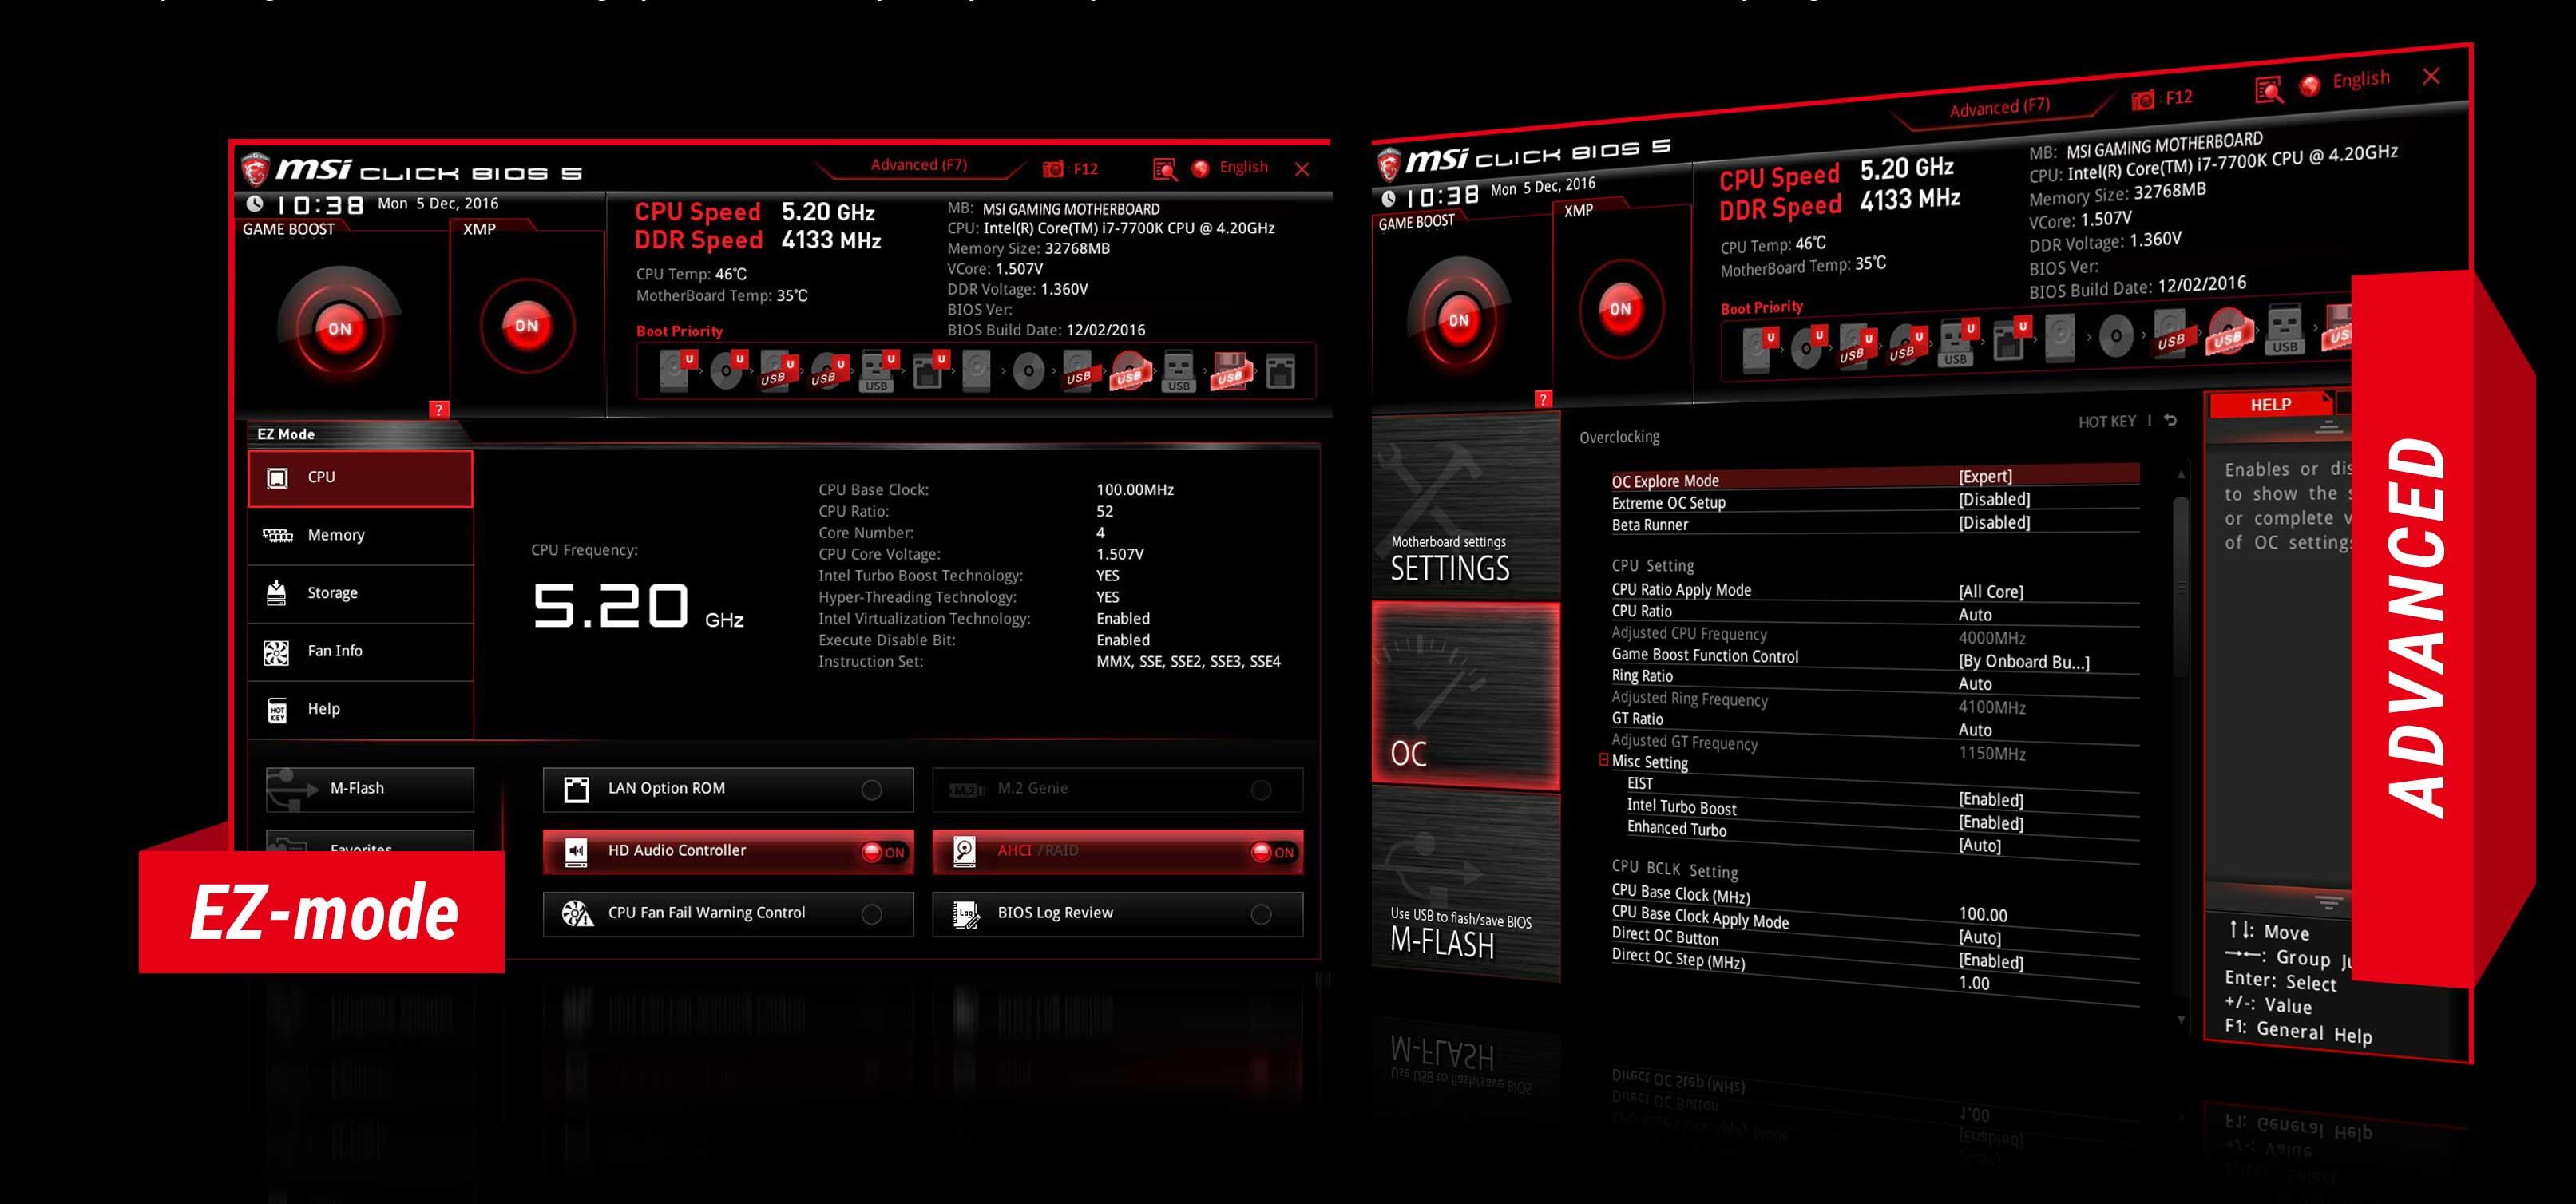 MSI Z270 Gaming M3 Motherboard (MSI Z270 GAMING M3